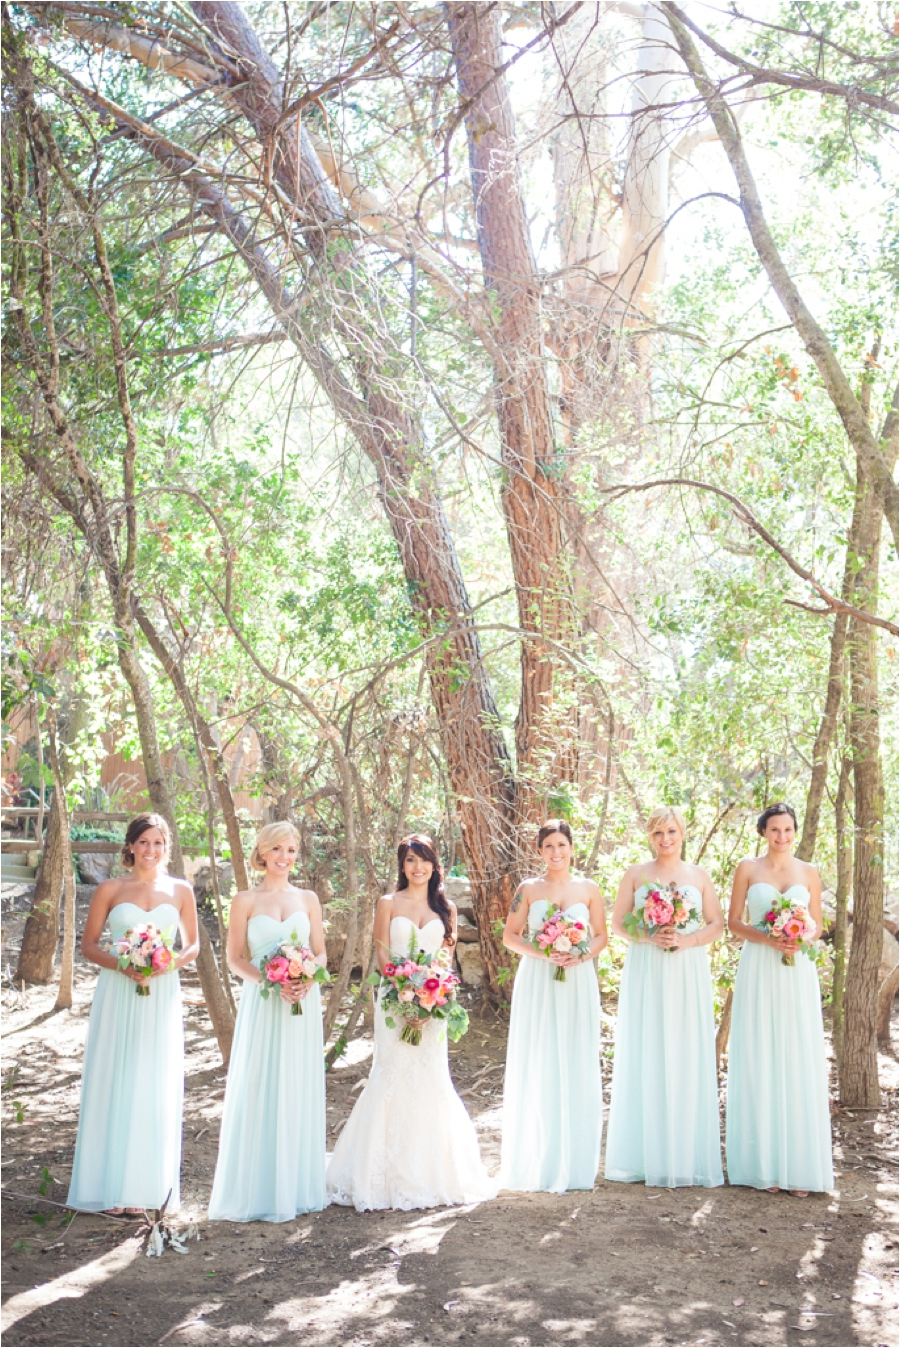 Jasmine and Donny- Calamigos Ranch Wedding ©Shaun and Skyla Walton-58.jpg